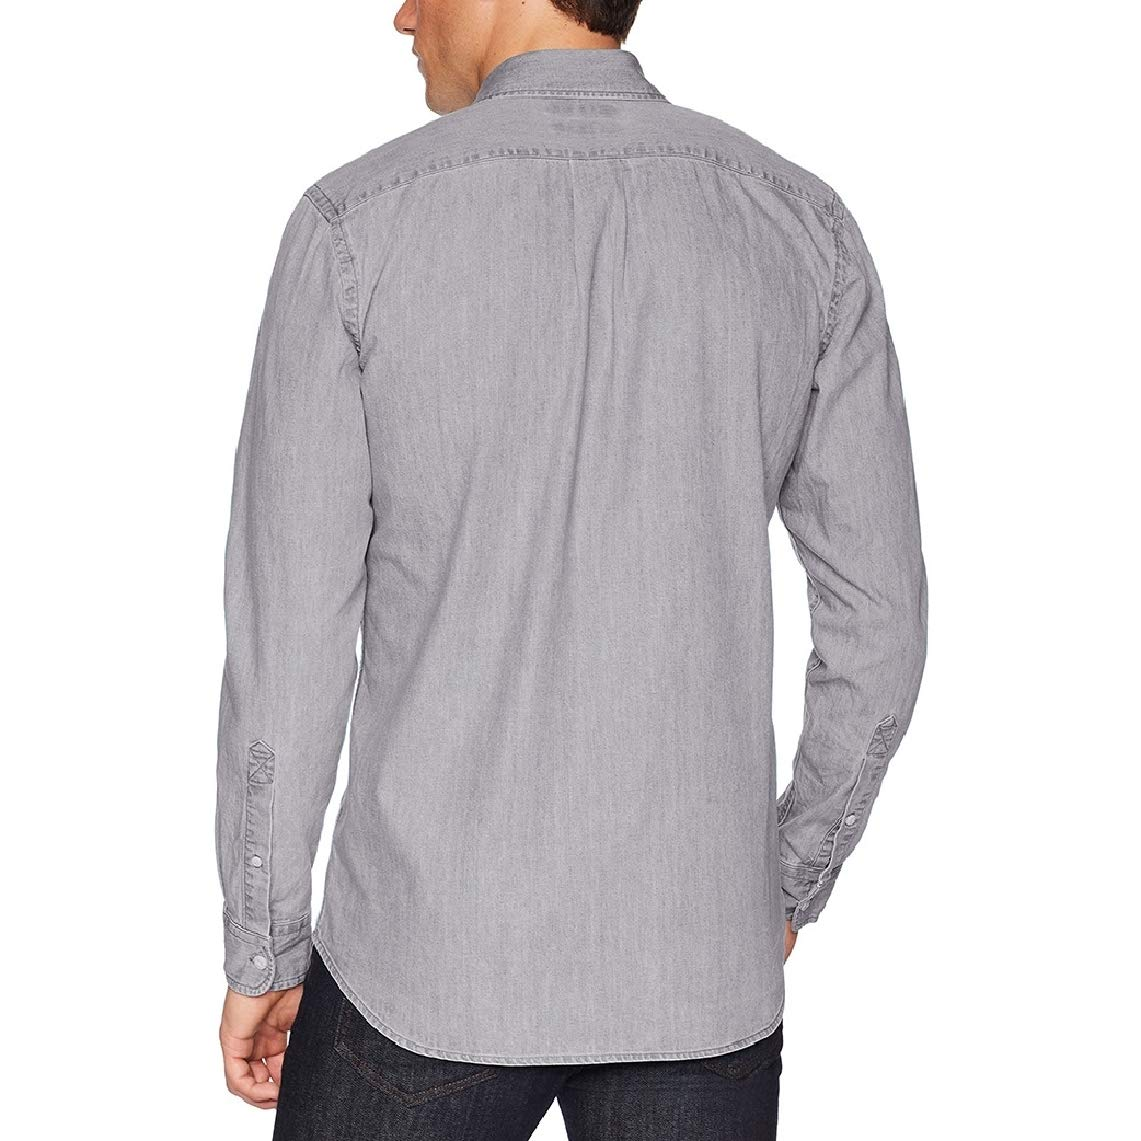 KaWaYi Mens Single-Breasted Retro Plus Size Jean Casual Work Shirt